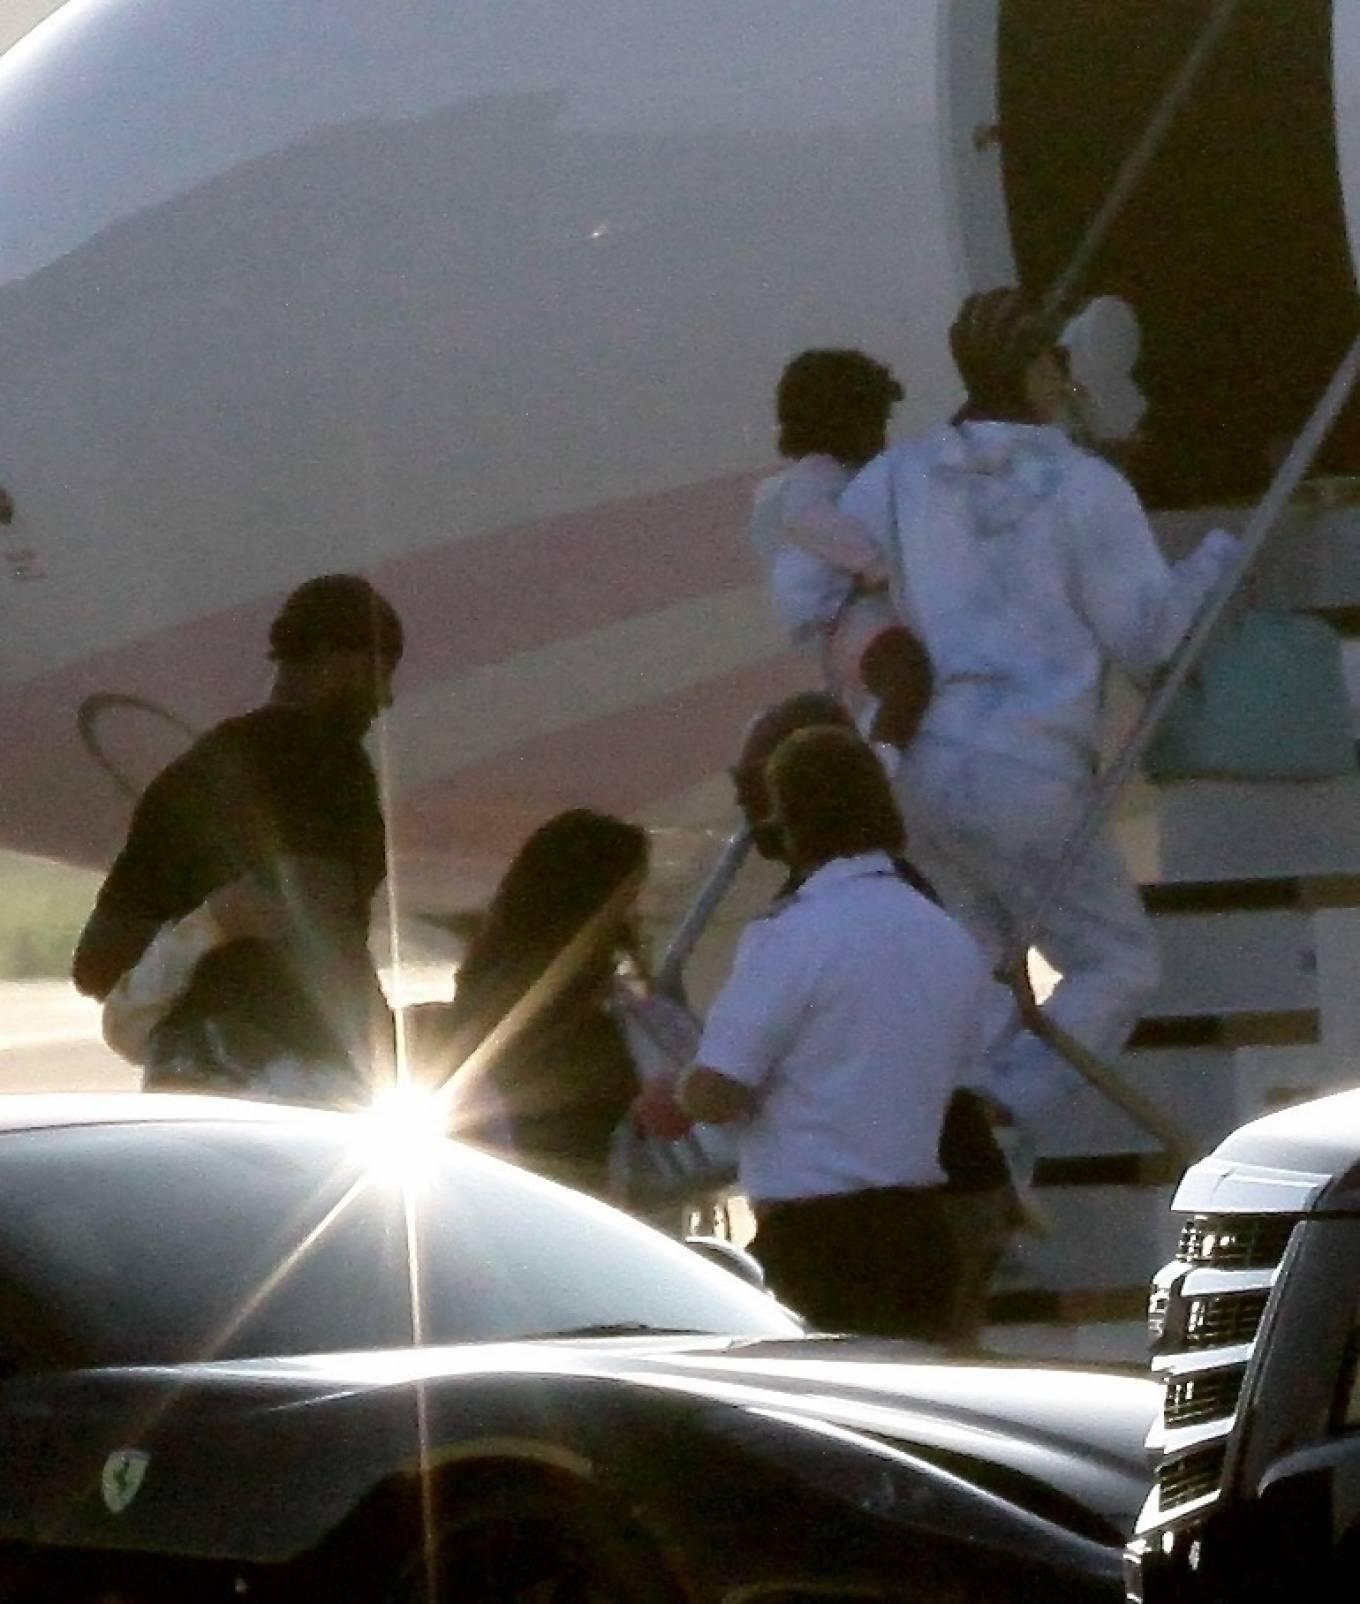 Khloe Kardashian 2020 : Khloe Kardashian and Kourtney Kardashian – Pictured boarding Kylie Jenners private jet in Van Nuys-08